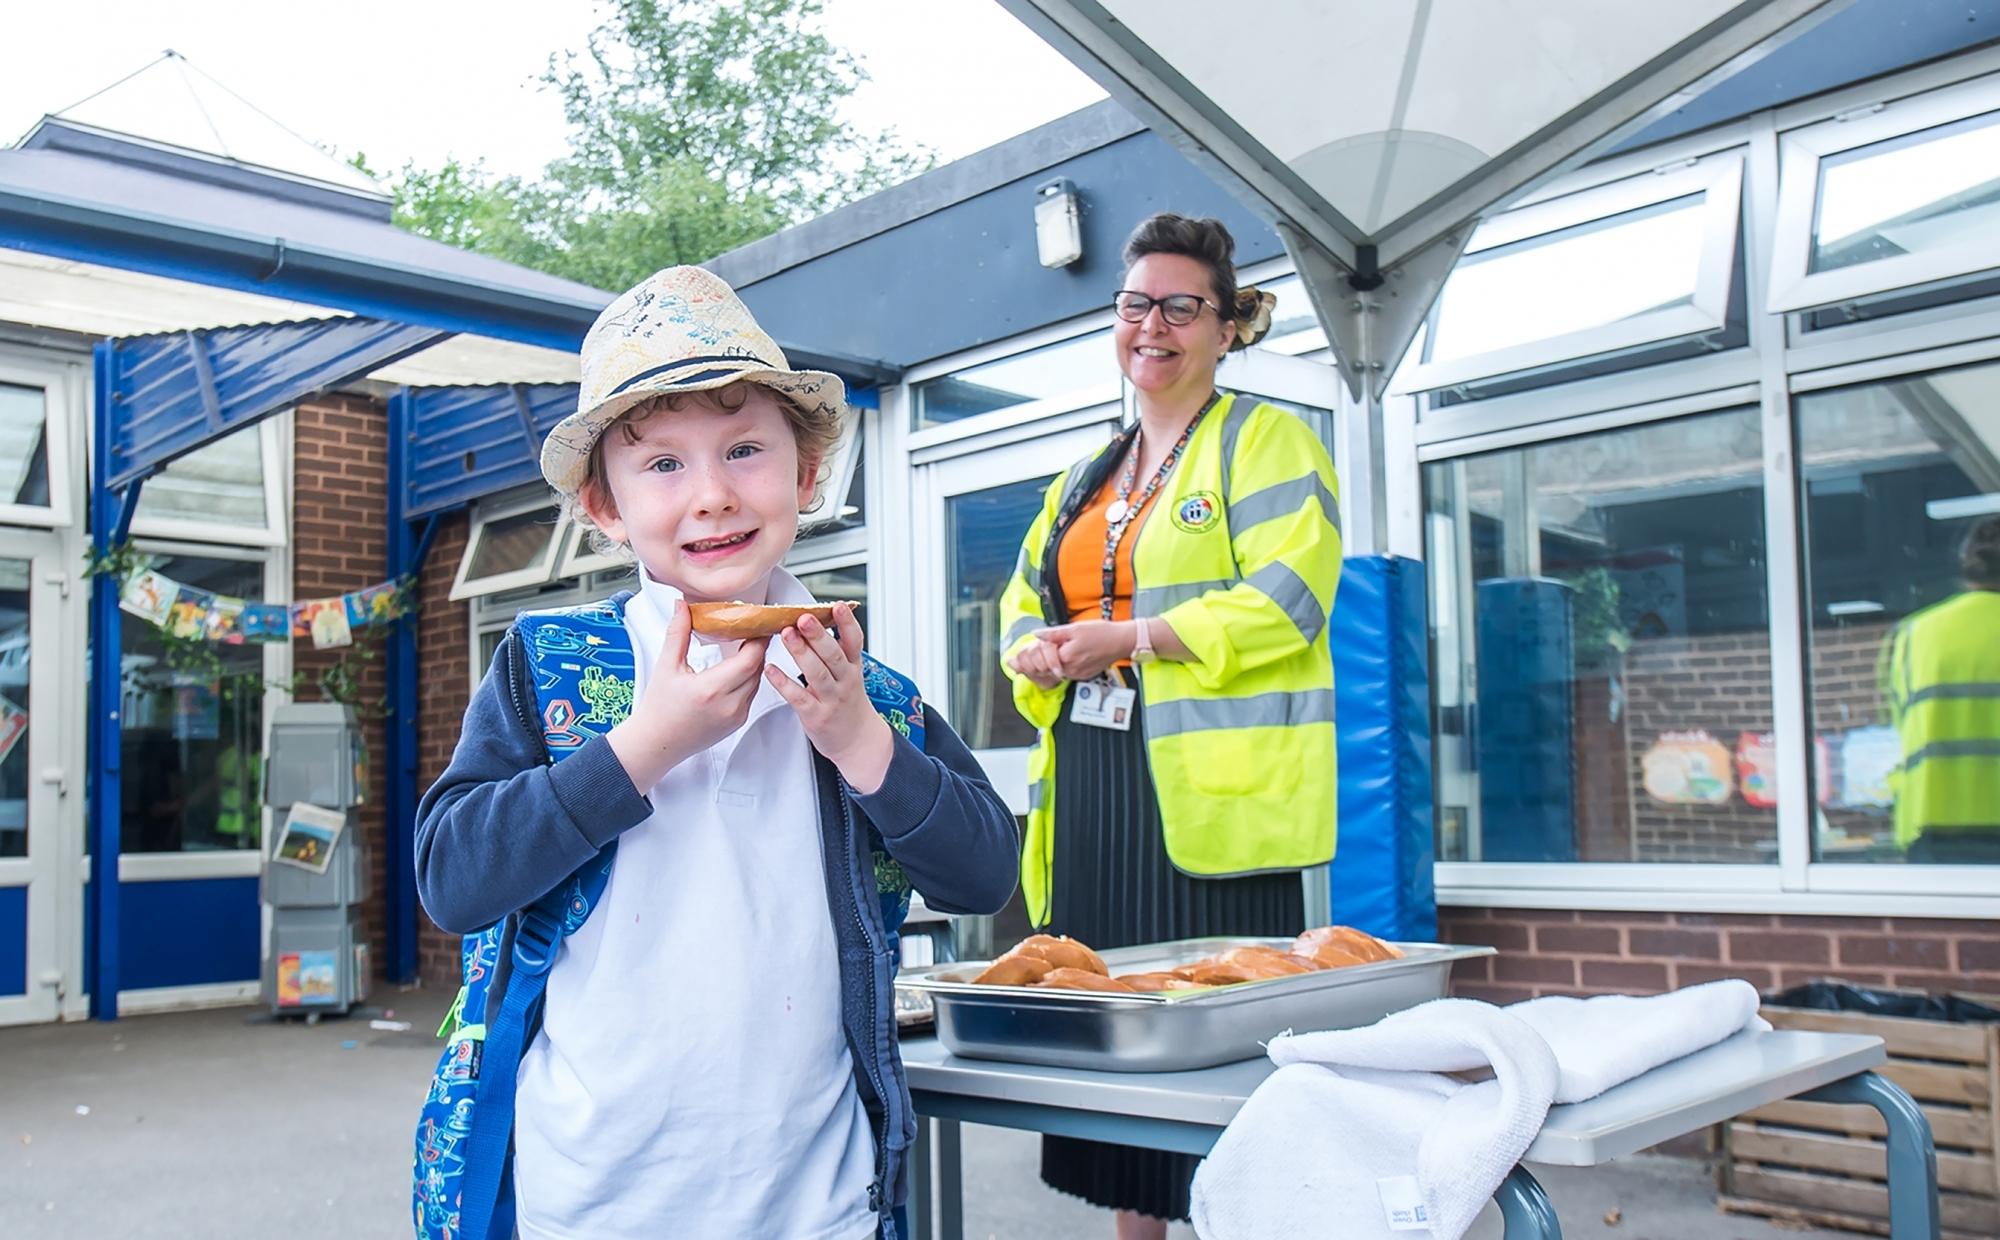 Pupil at St Philip's CE Primary School